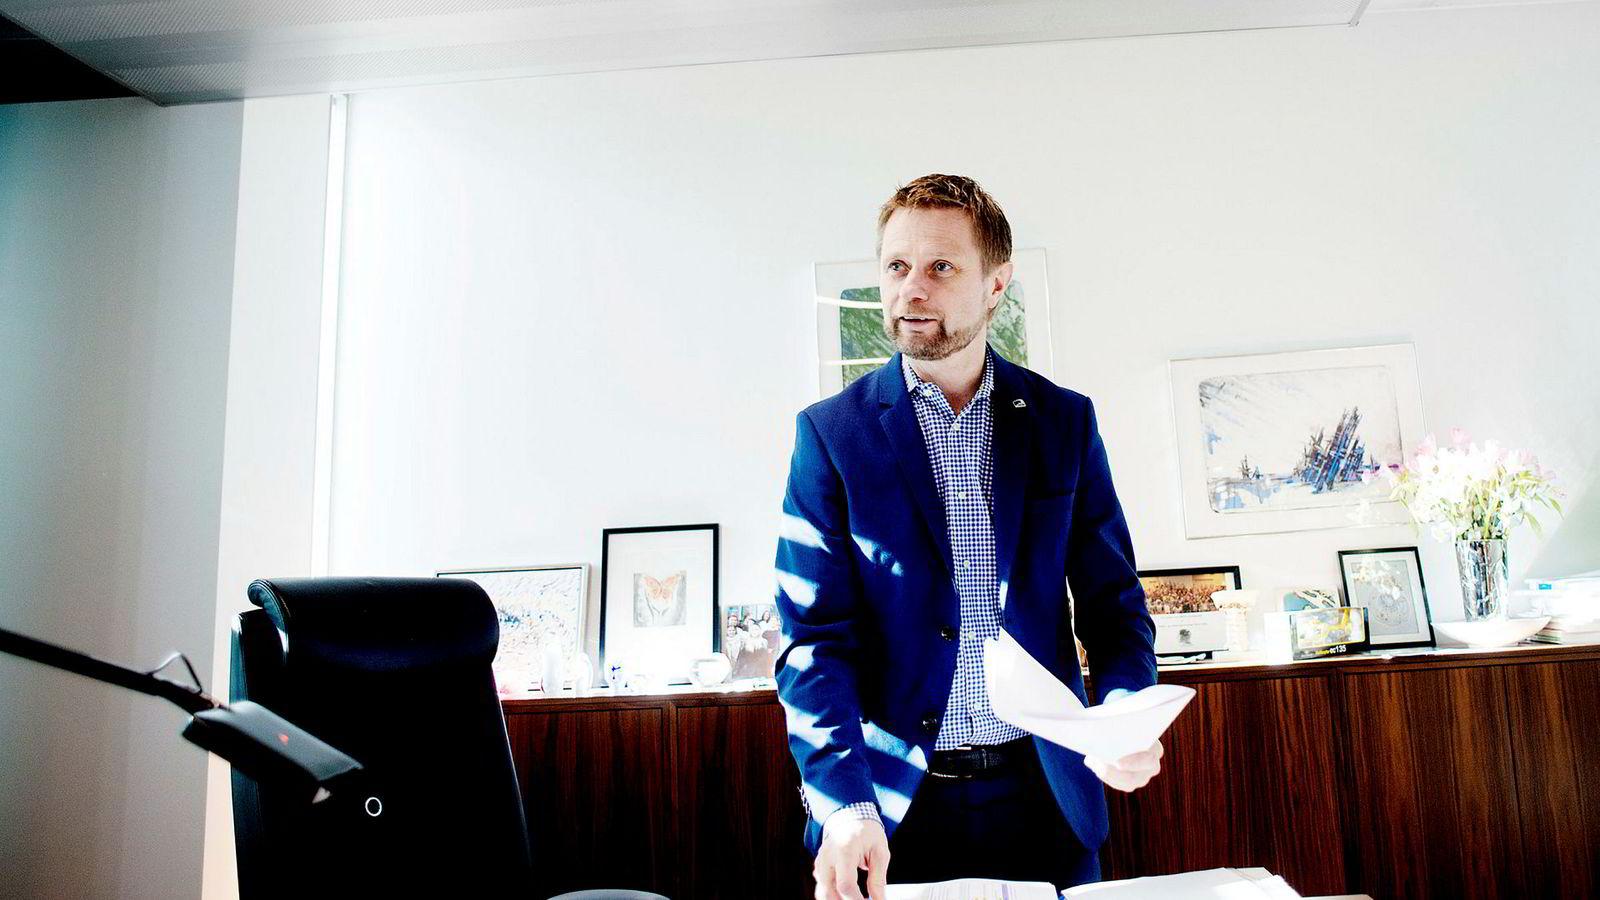 Helseminister Bent Høie vil formane sykehuslederne når han holder sin årlige sykehustale tirsdag.